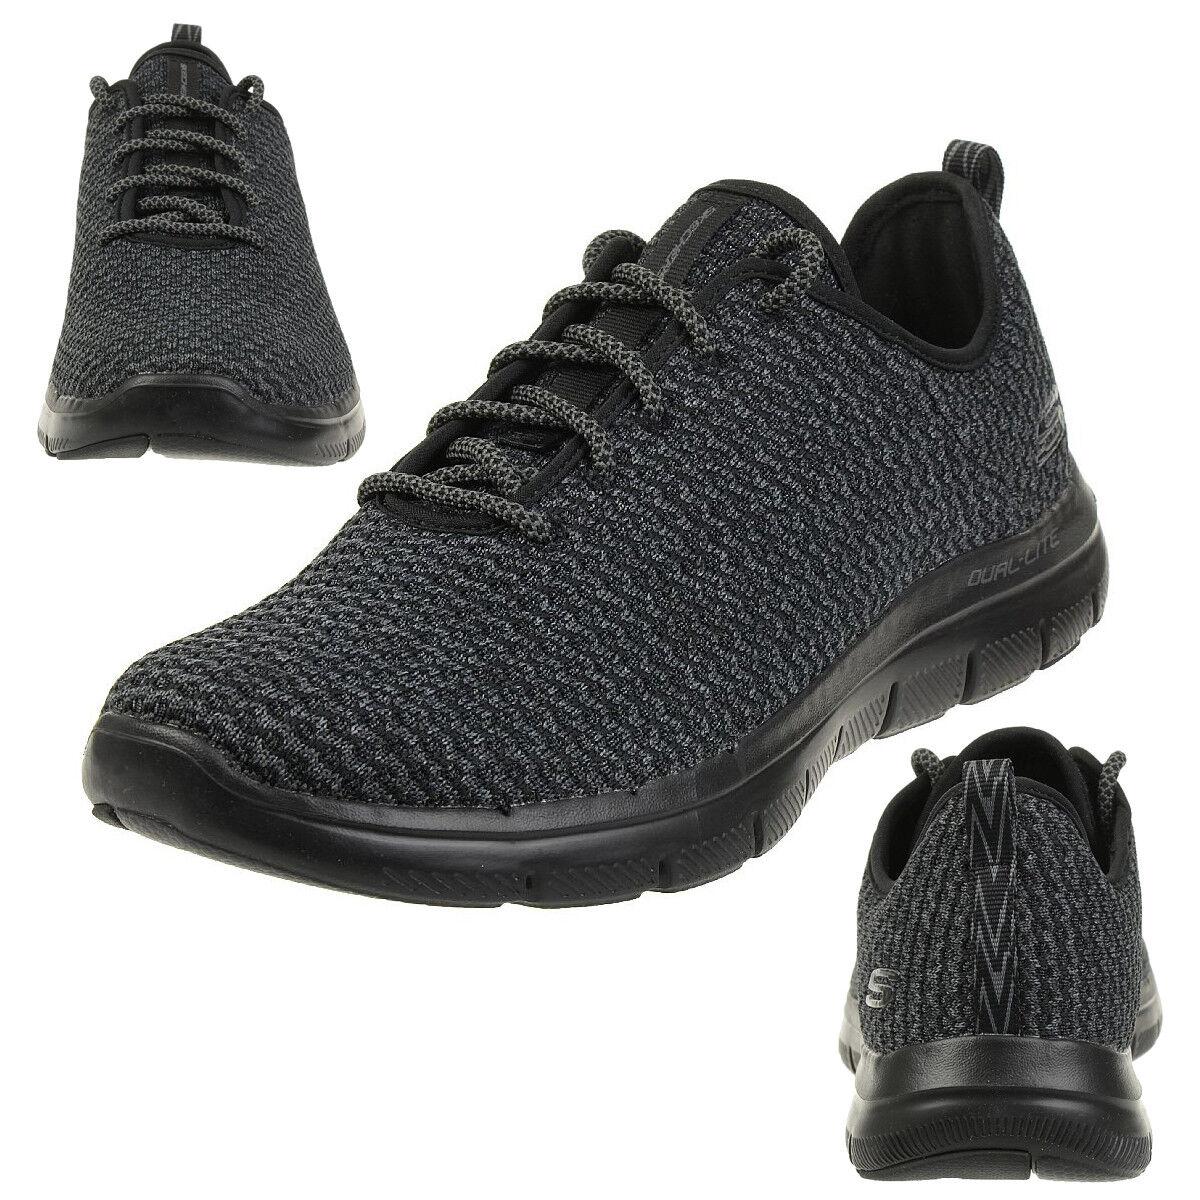 Skechers Skech Flex Advantage 2.0 Cravy Herren Sneaker Fitness Schuhe BBK